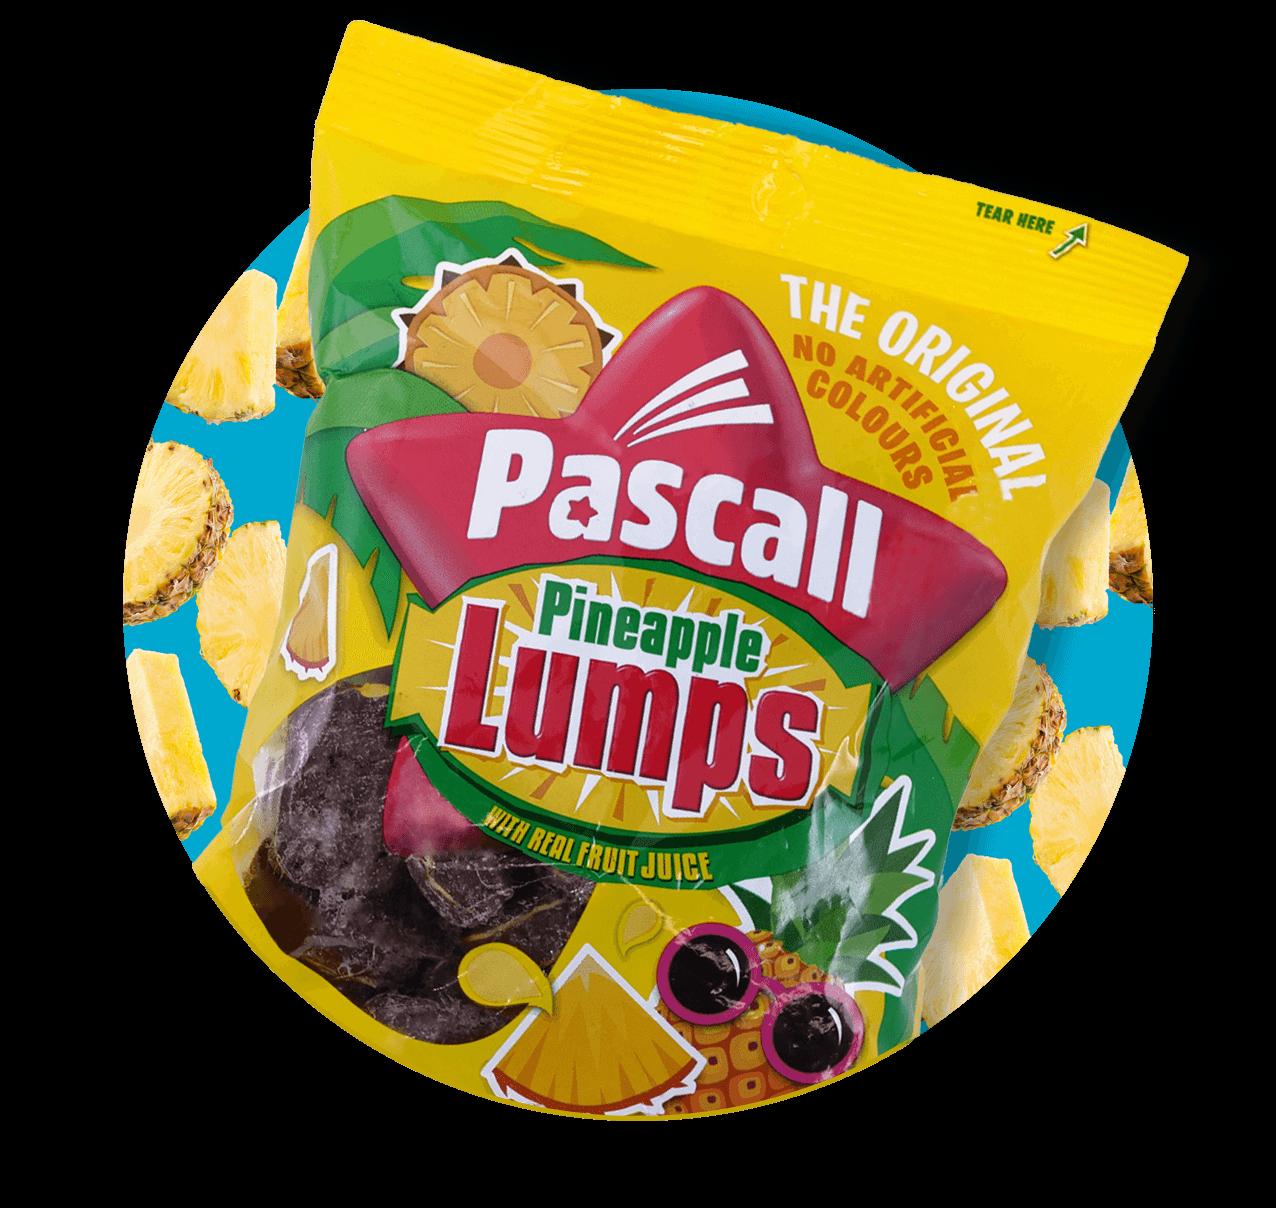 Pascall's Pineapple Lumps